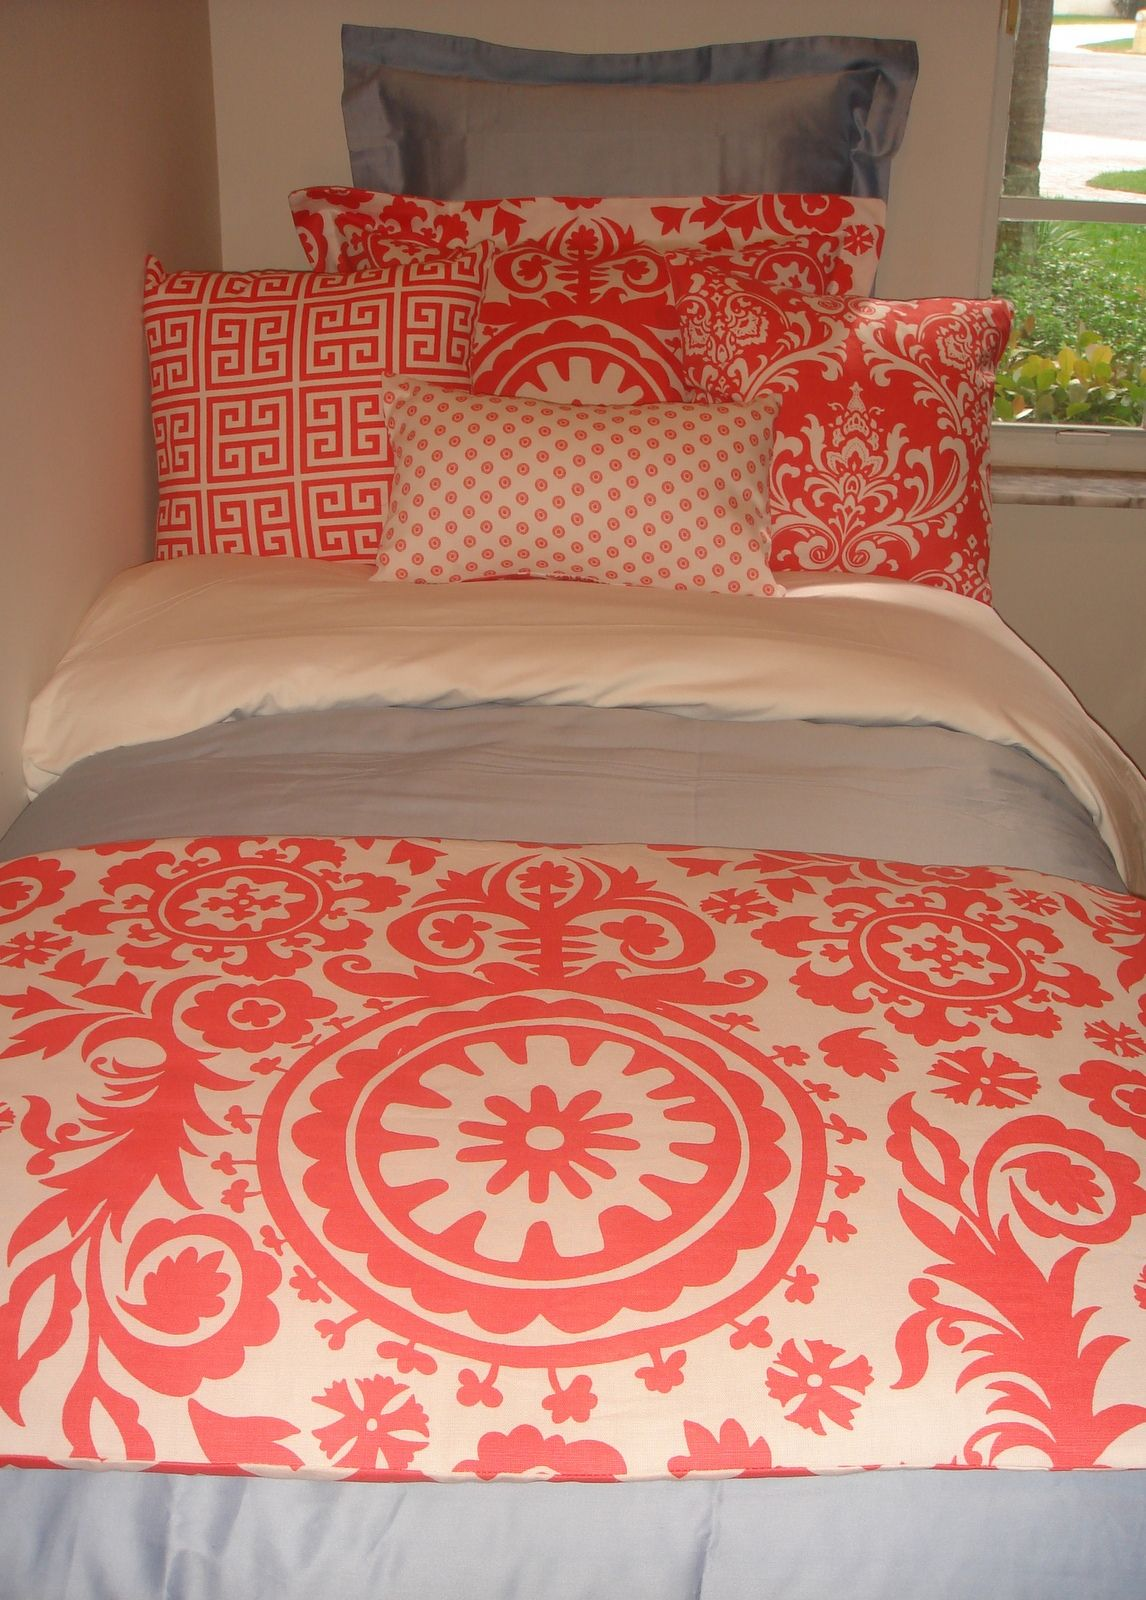 Preppy Gray Dorm Room Bedding   Dorm bedding sets, Dorm ...